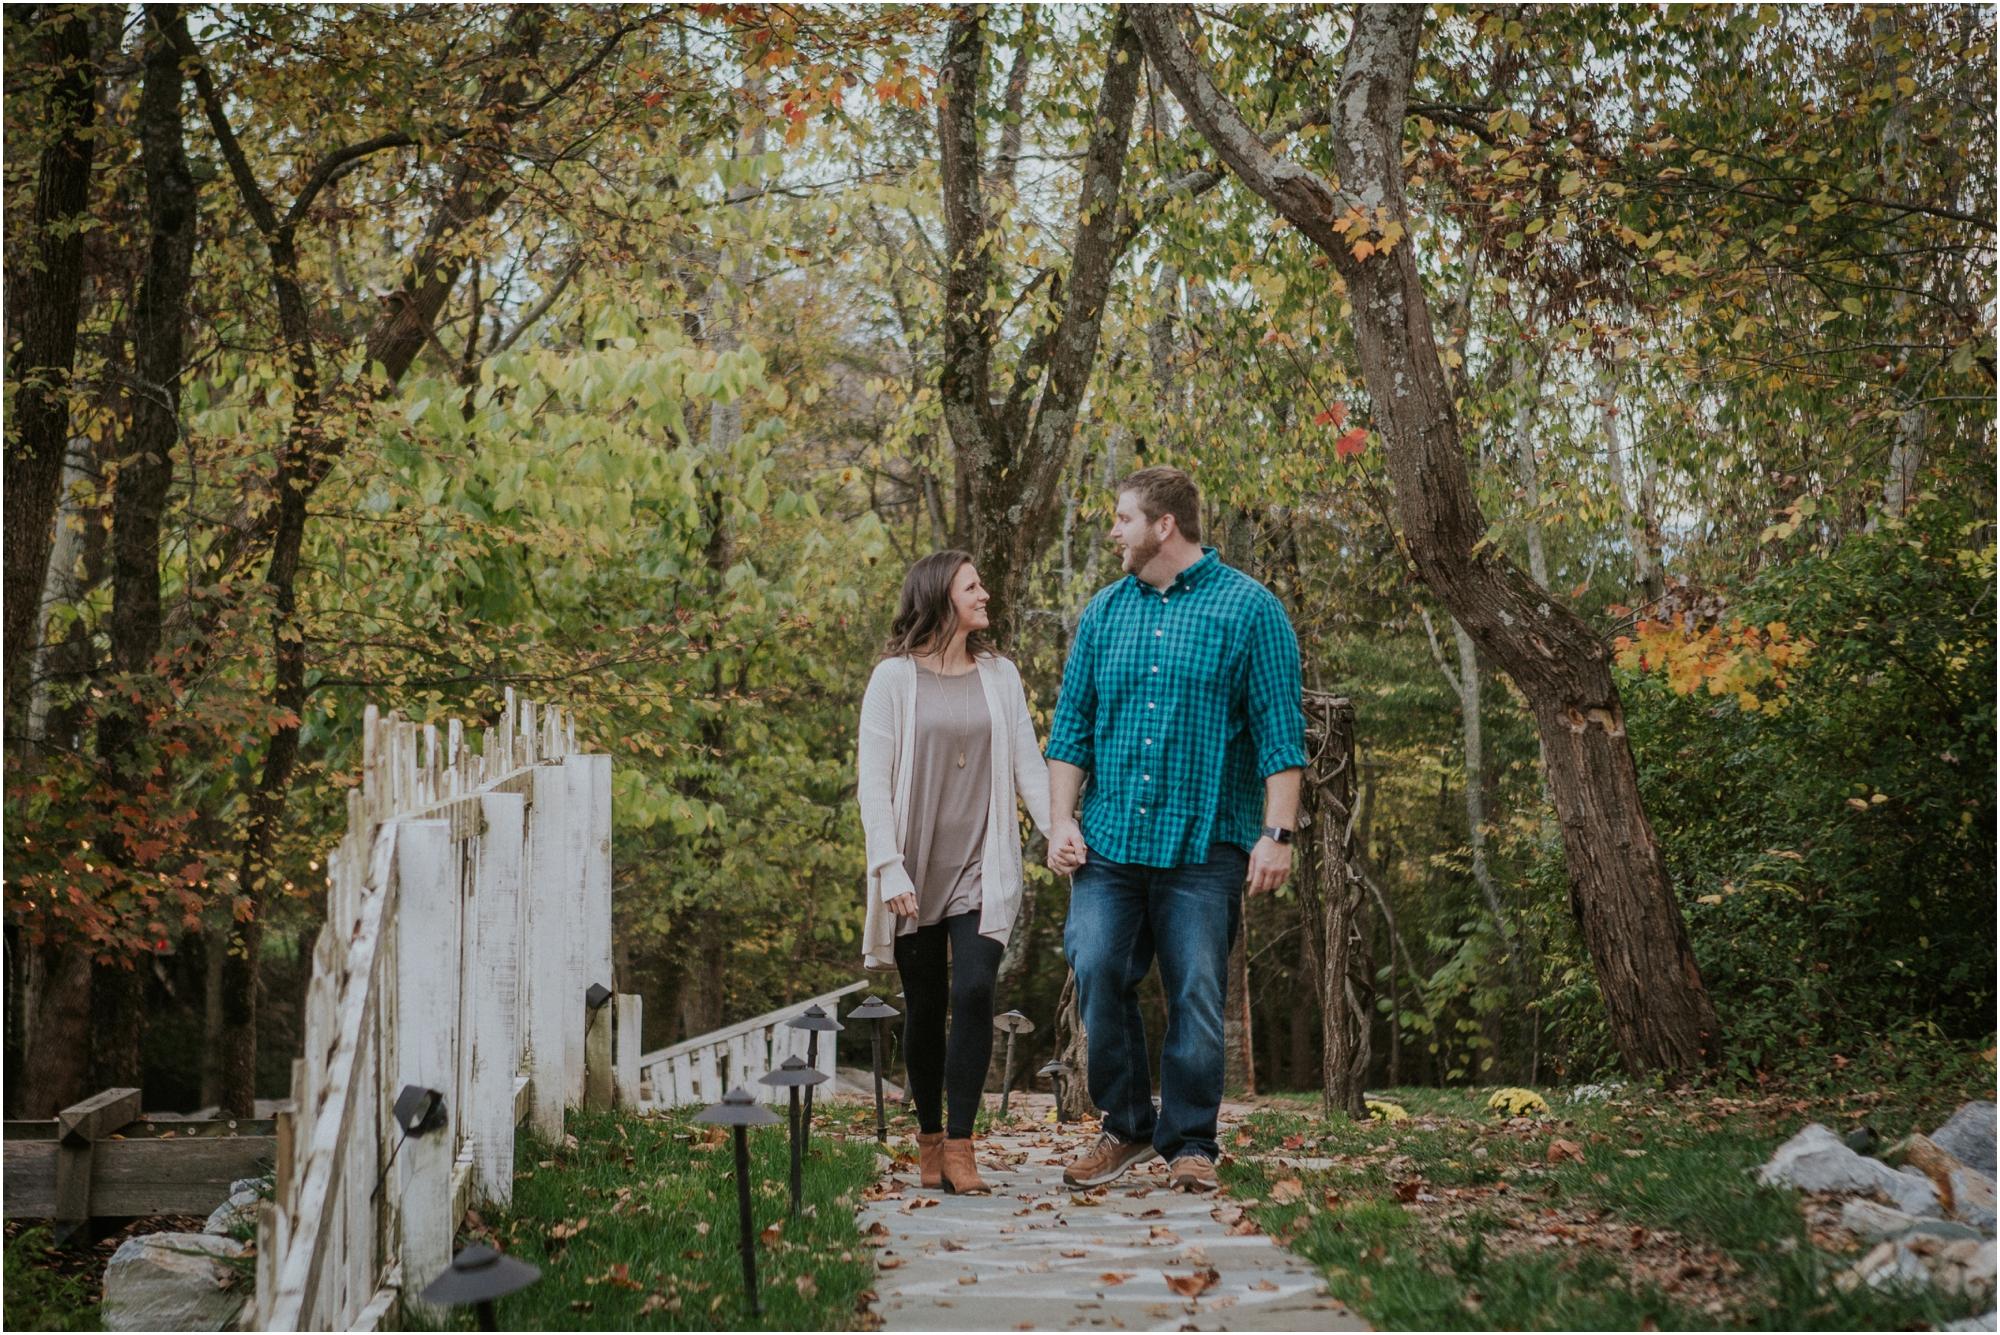 katy-sergent-millstone-limestone-tn-rustic-fall-engagement-session-adventurous-outdoors-intimate-elopement-wedding-northeast-johnson-city-photographer_0004.jpg